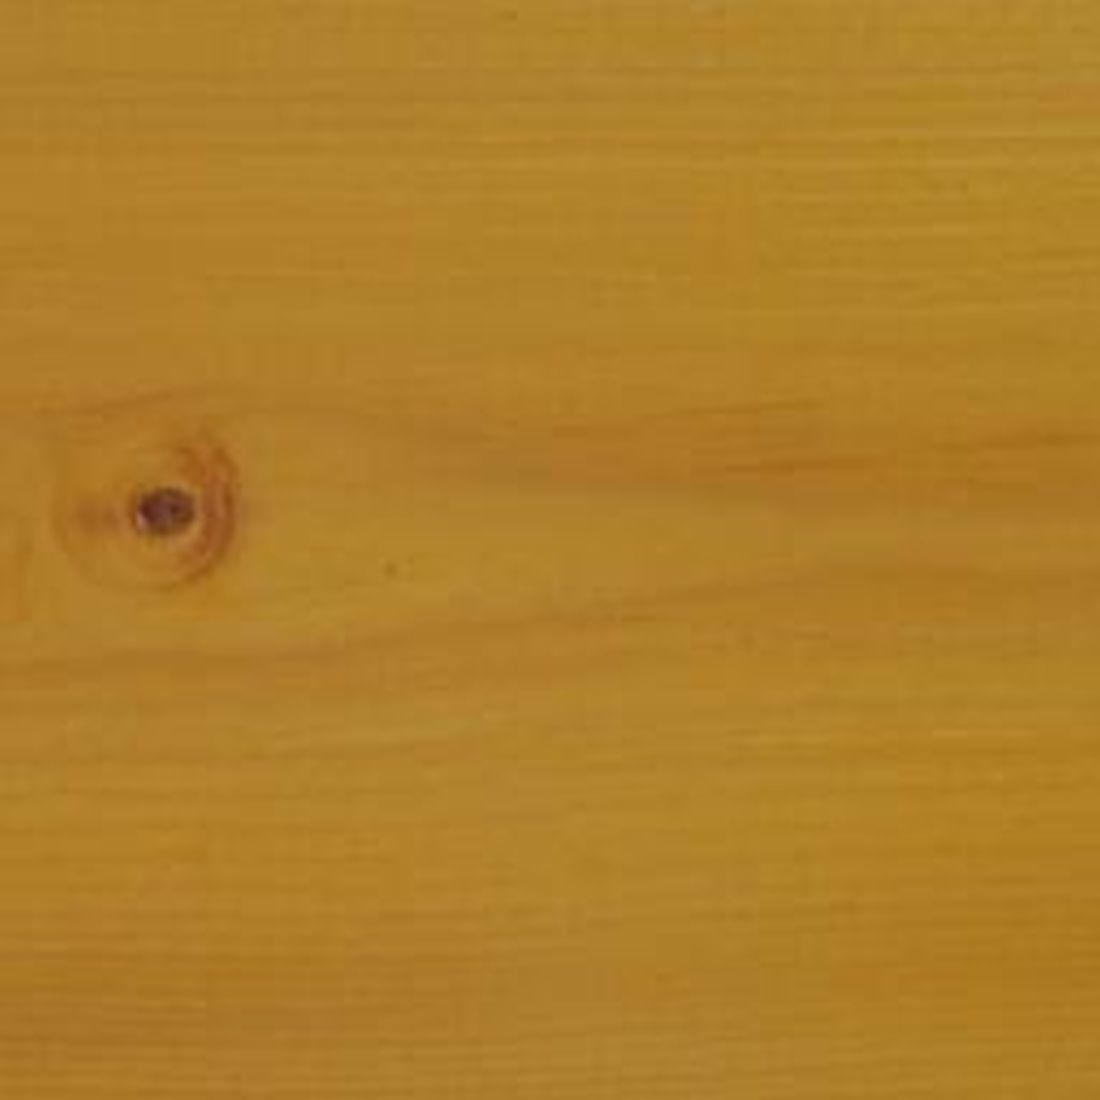 Farbton der Mai-Tech Holzlasur: Kiefer